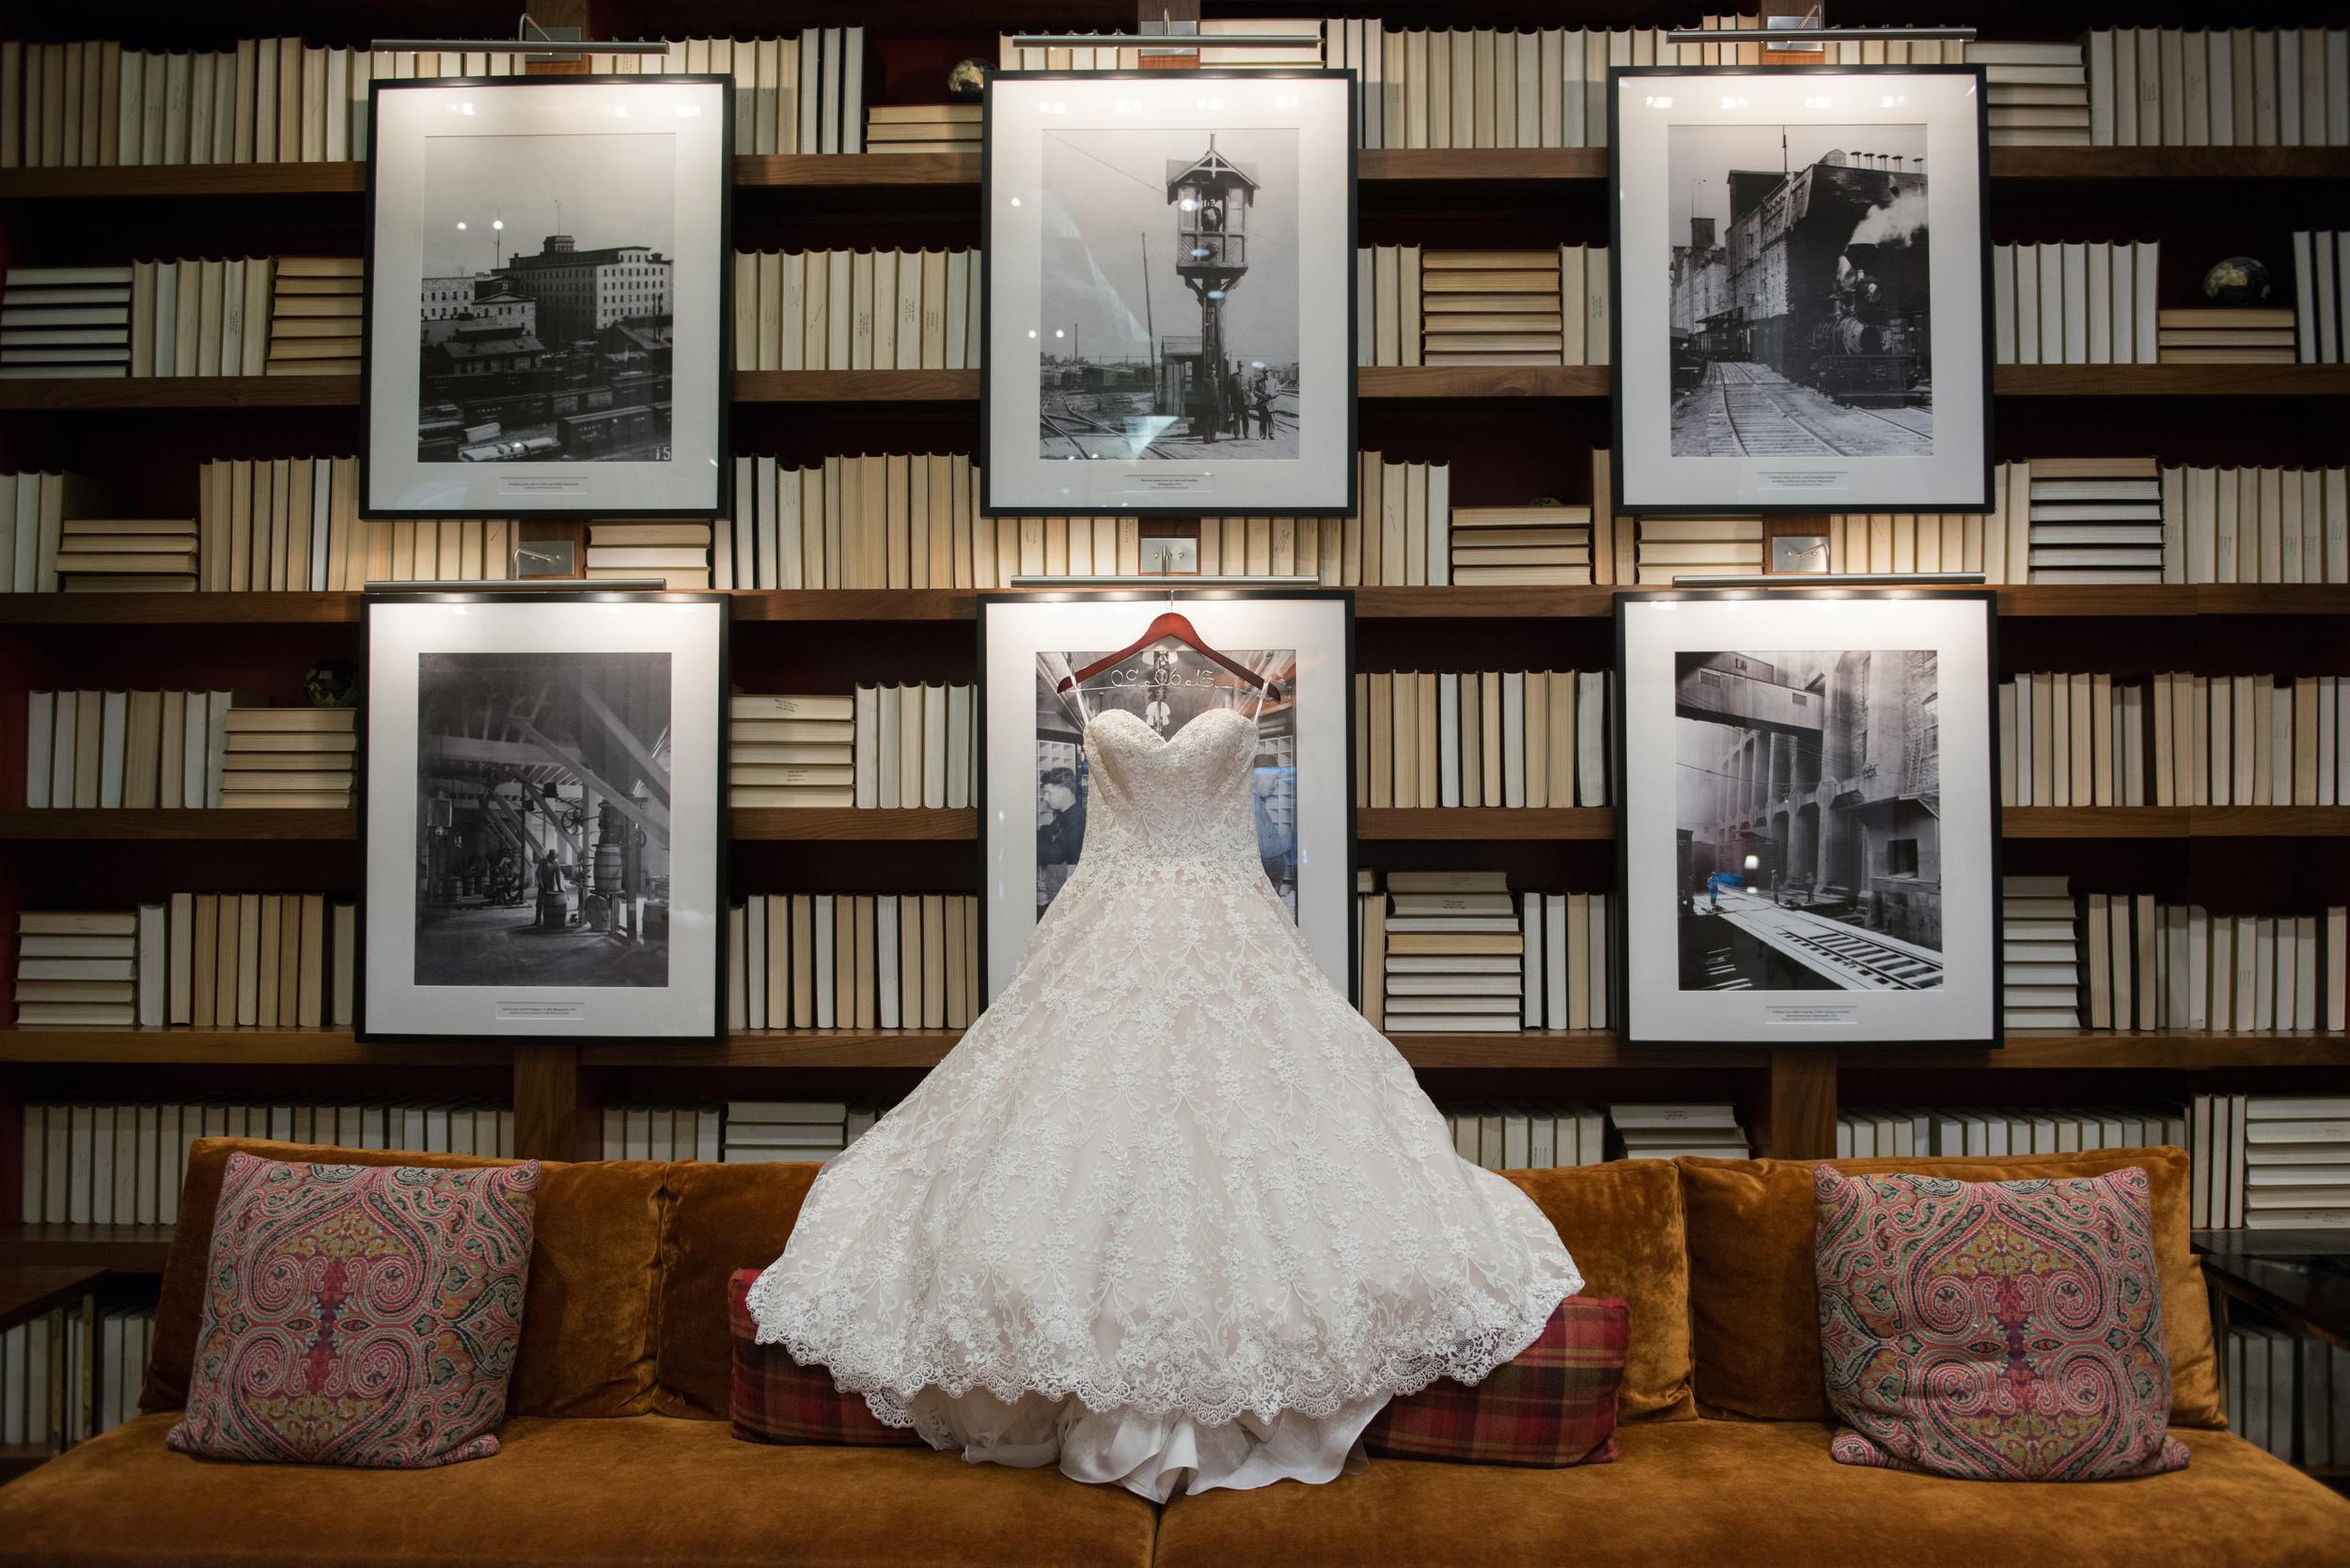 Acowsay_Cinema_MN_Wedding_Gown.jpg